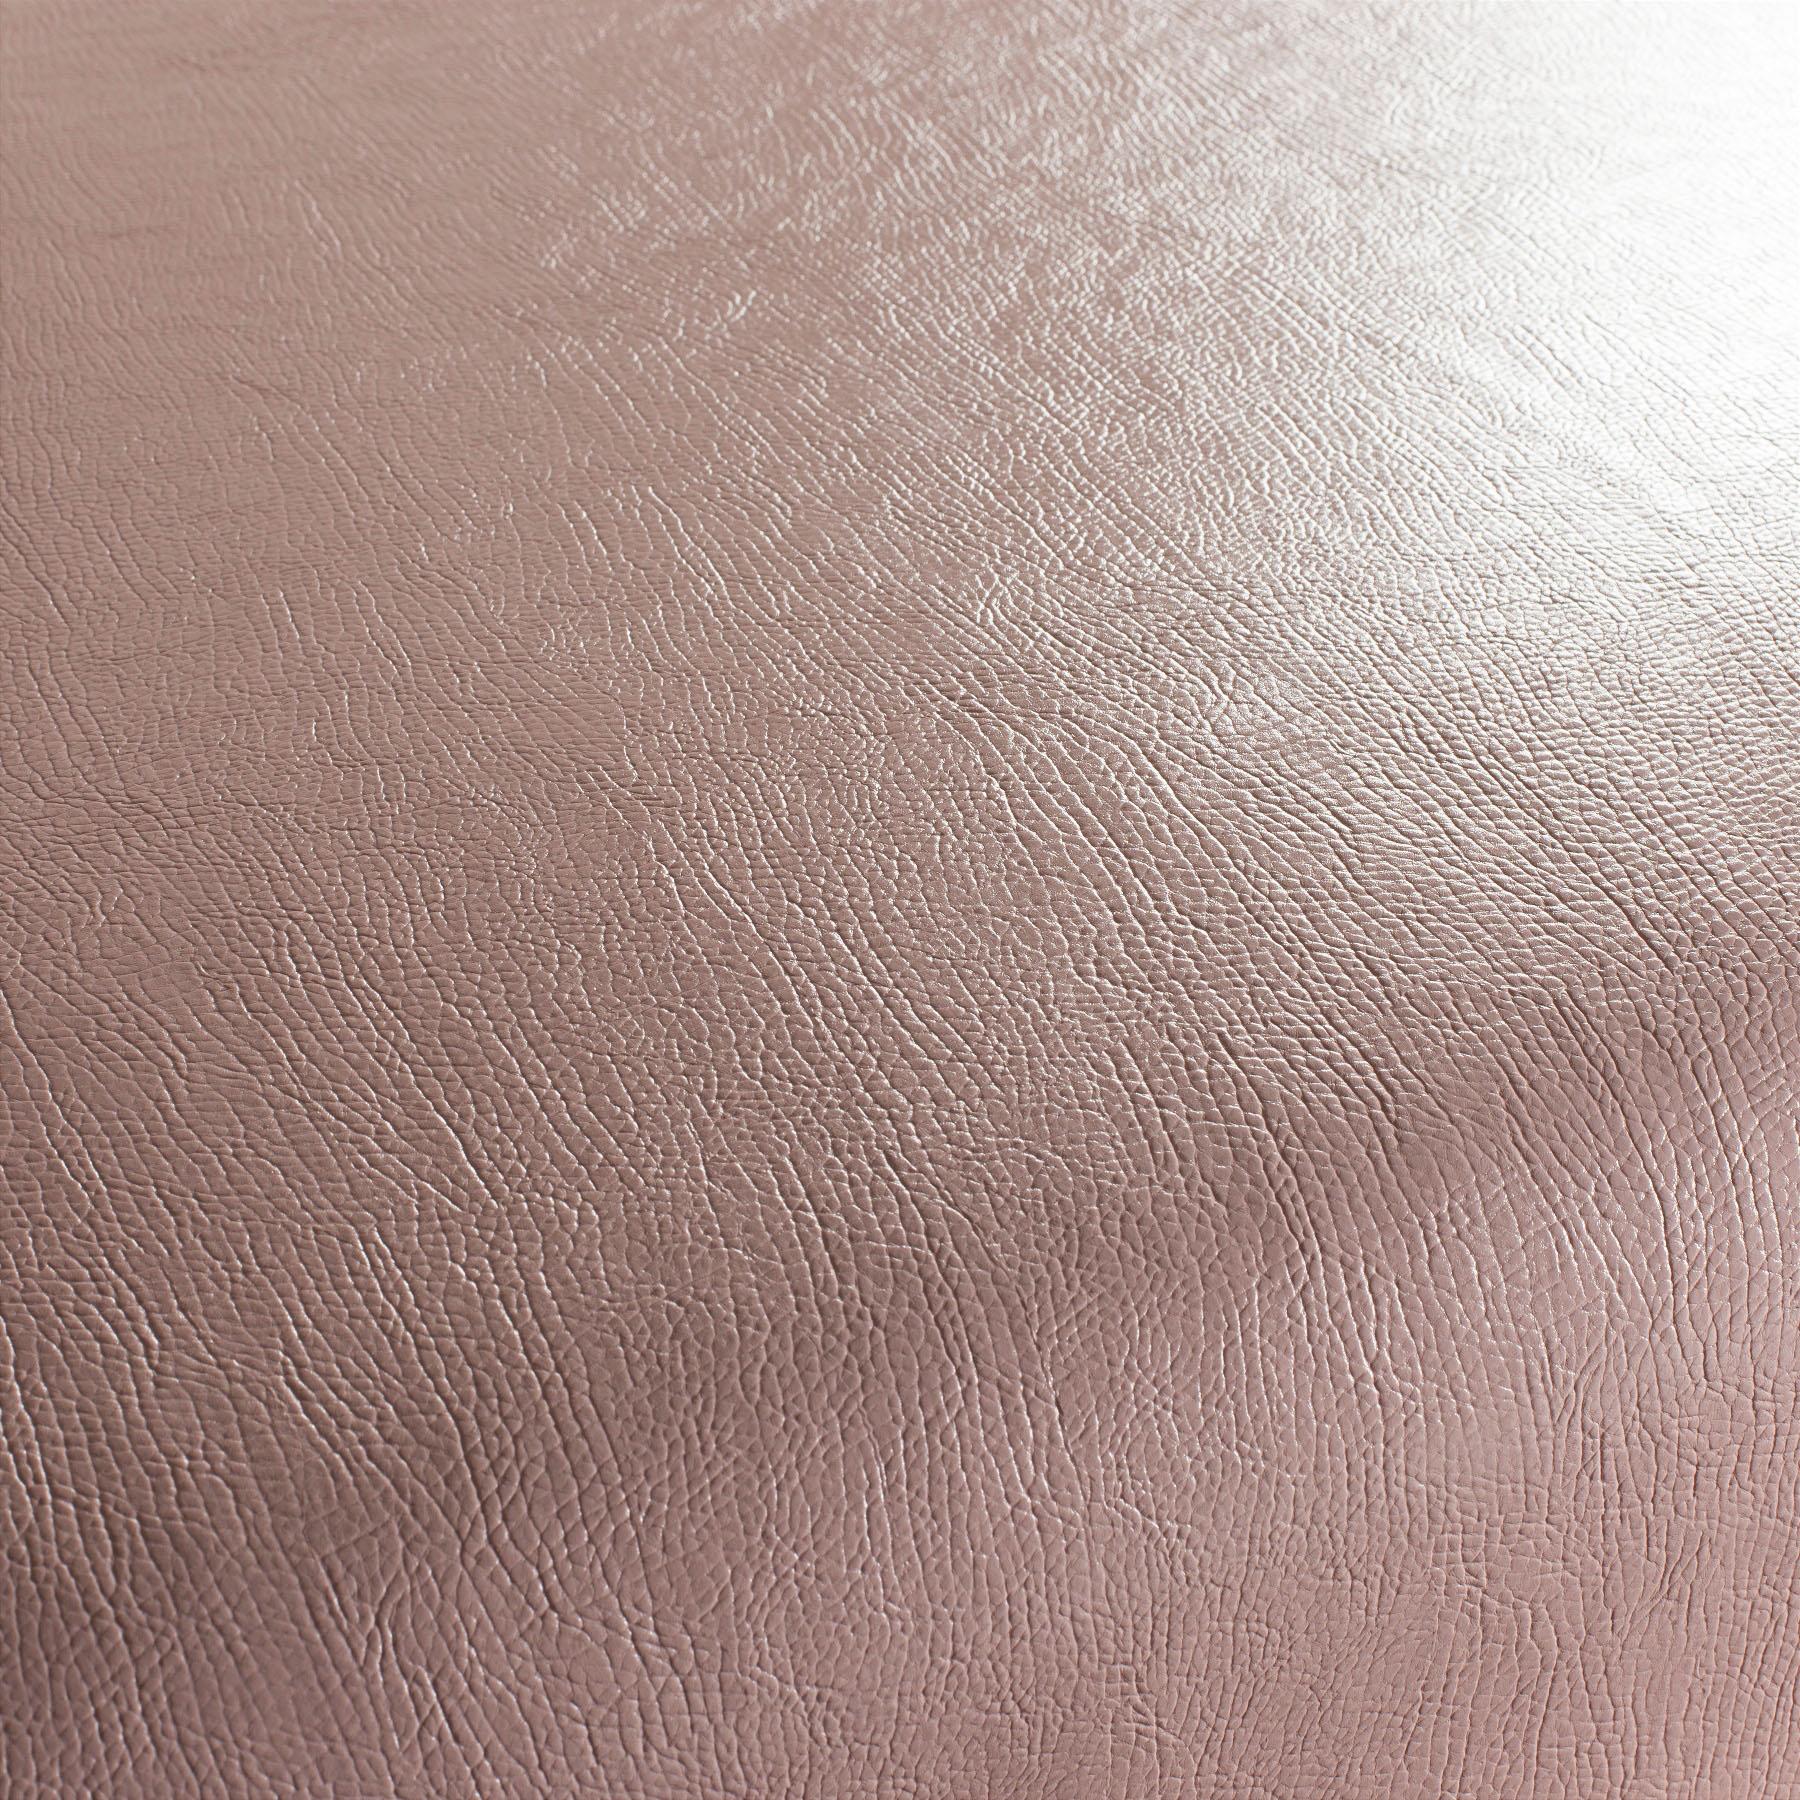 Upholstery Fabric Rocky 1 1280 060 Jab Anstoetz Fabrics